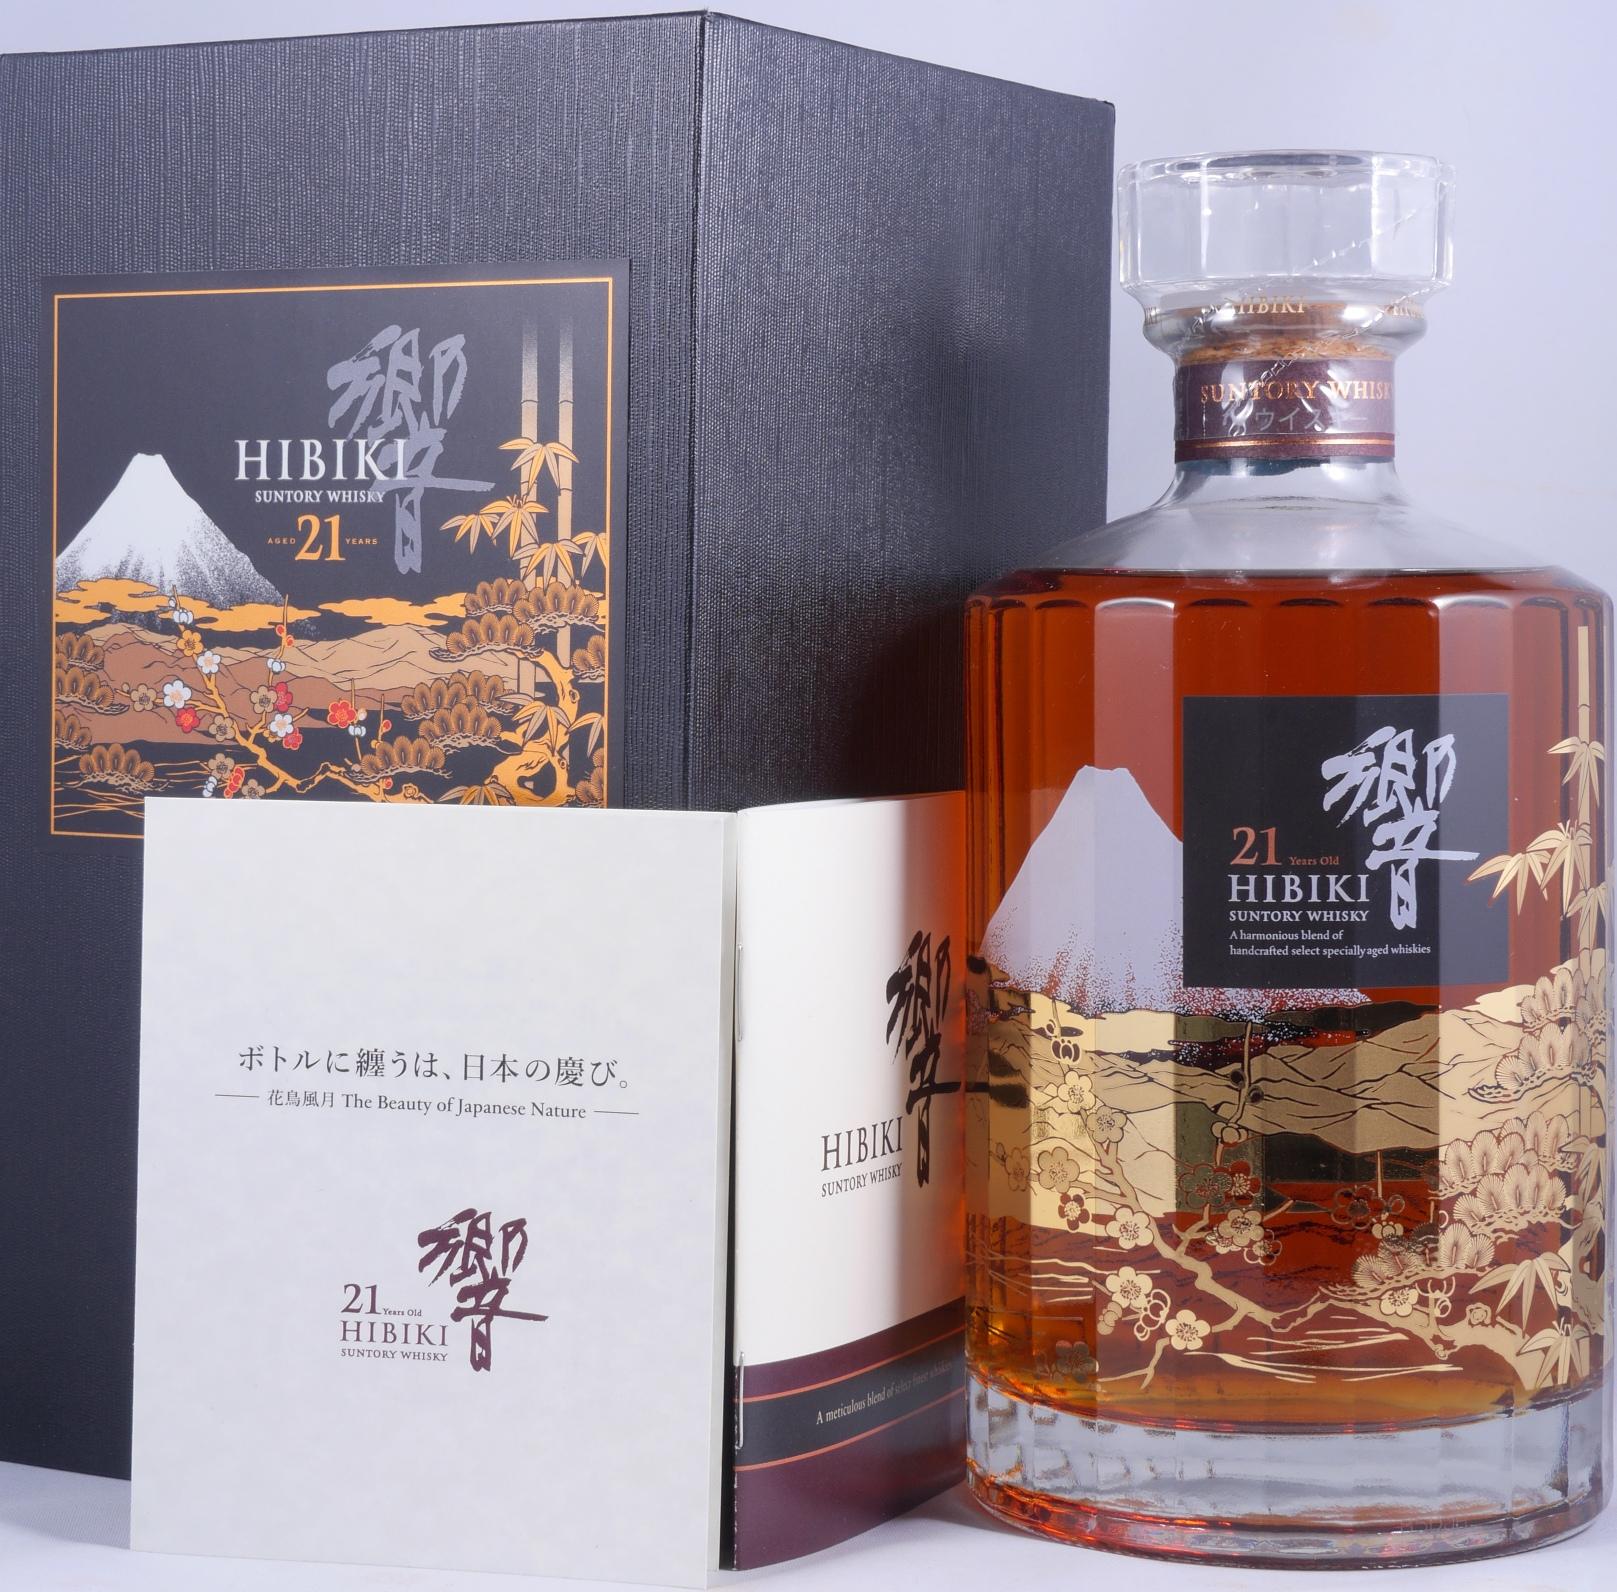 hibiki 21 limited edition 2014